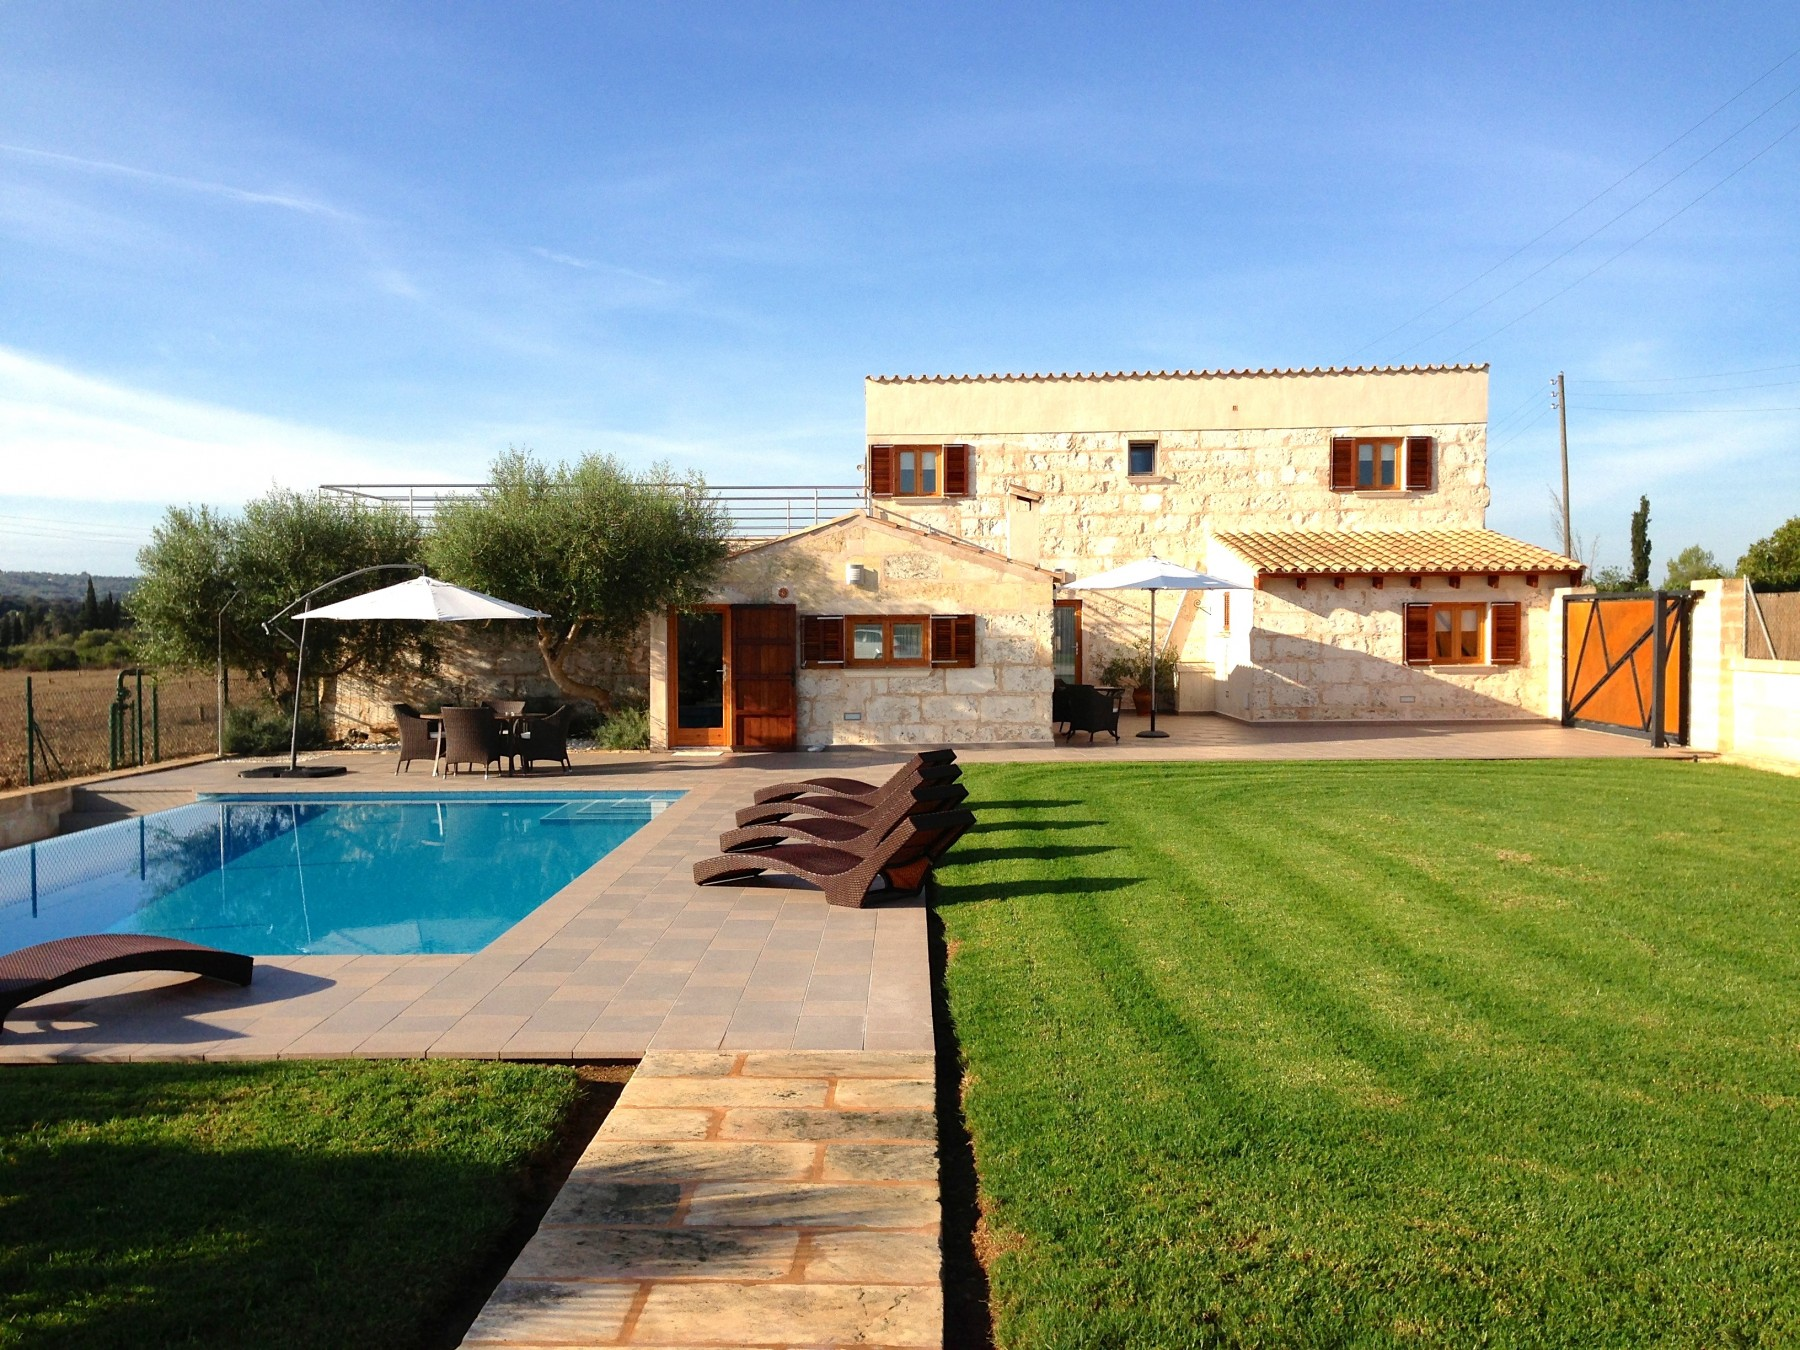 Vinagrella for 6 guests in Muro, Spain